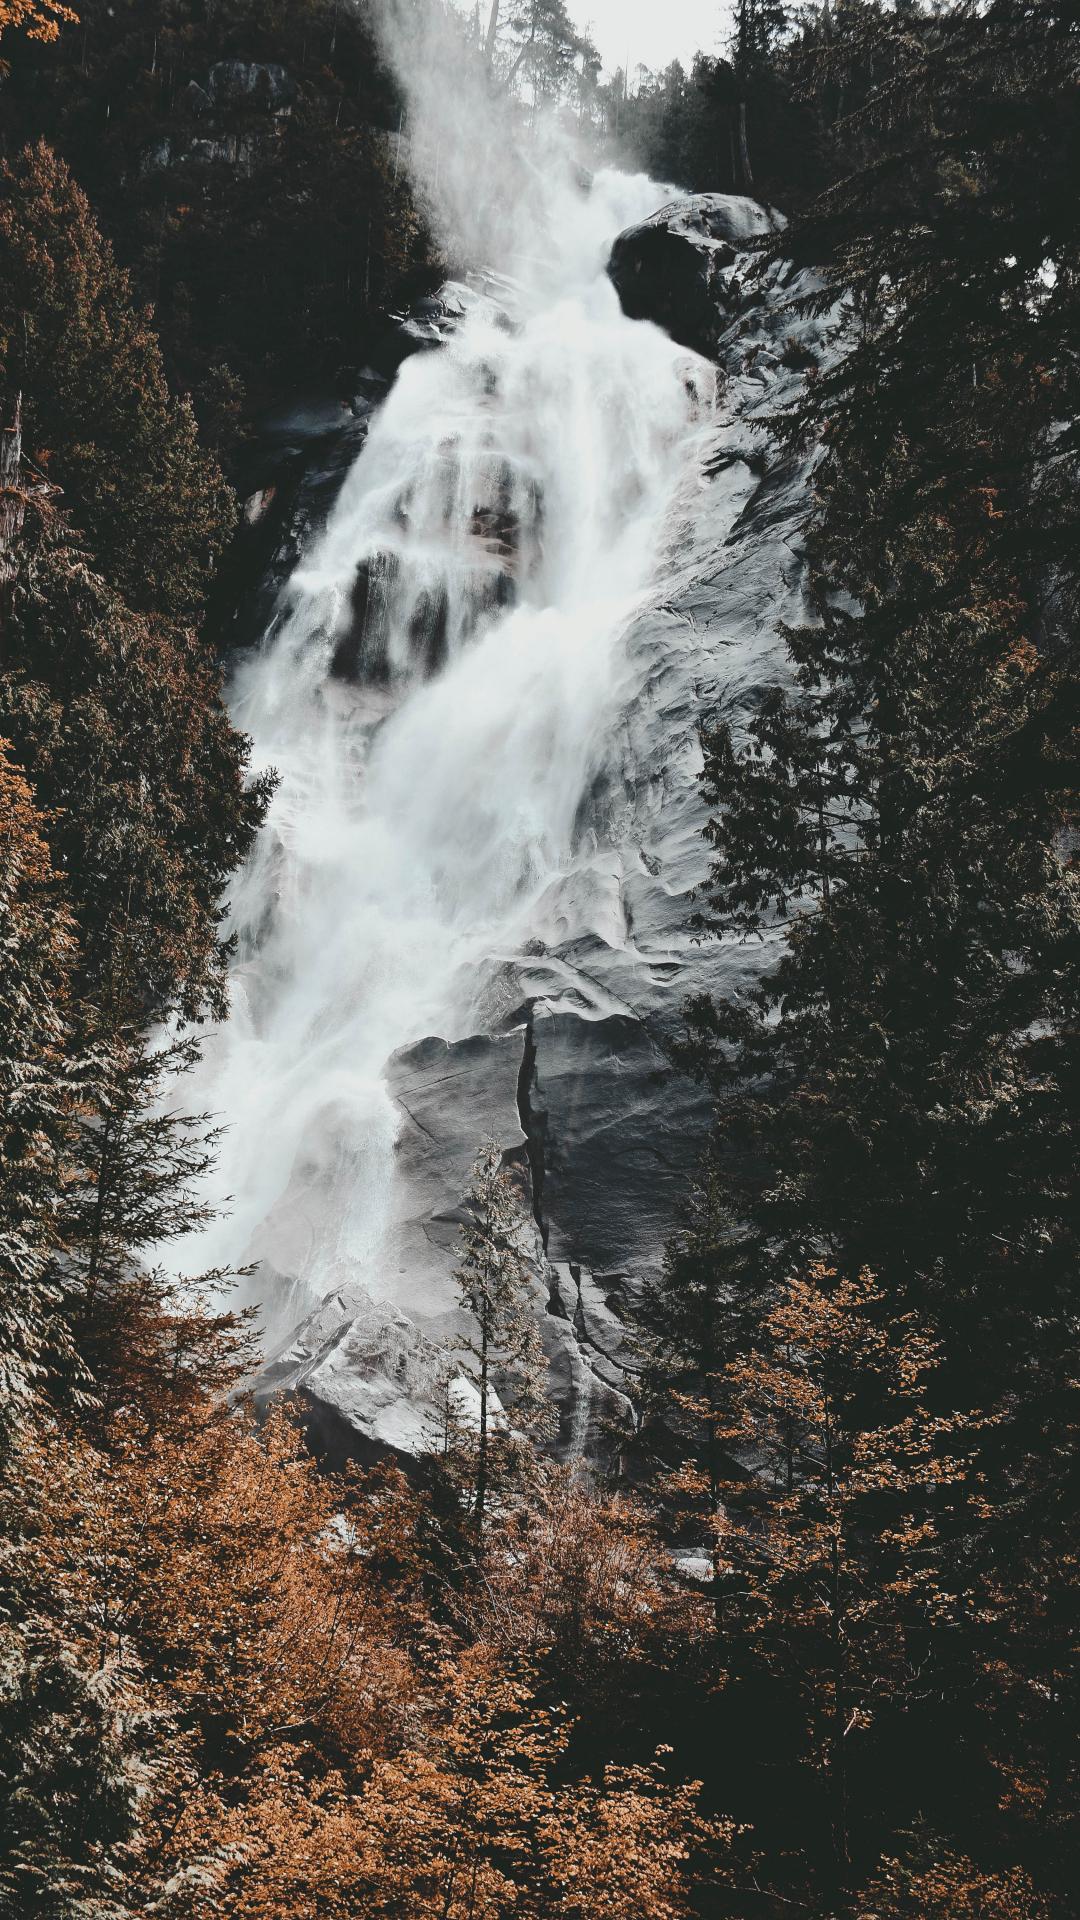 Tree, Waterfall, Wilderness, Rock iPhone Wallpaper